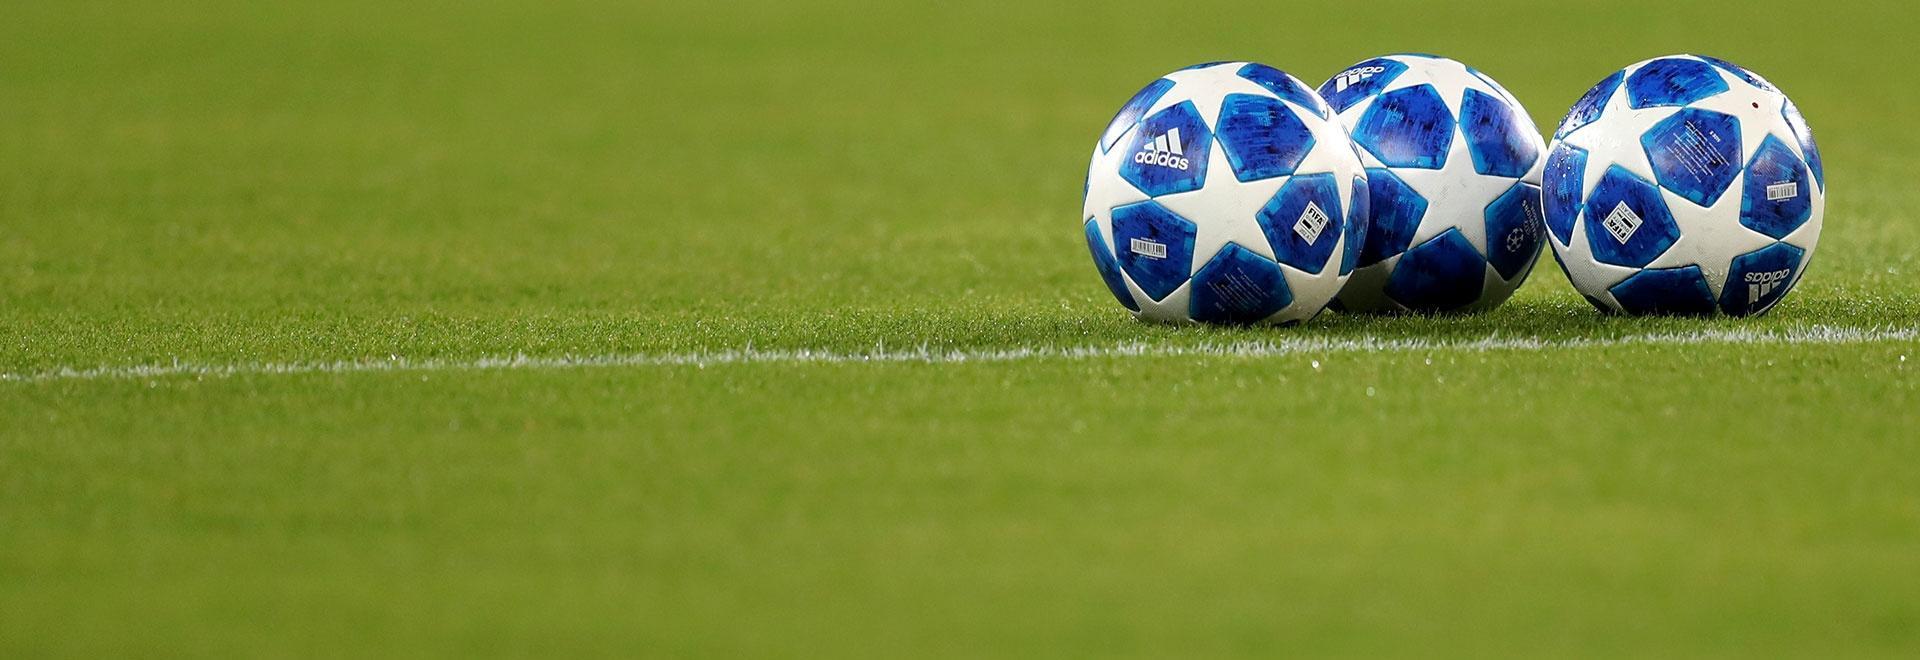 Chelsea - Bayern M. 25/02/20